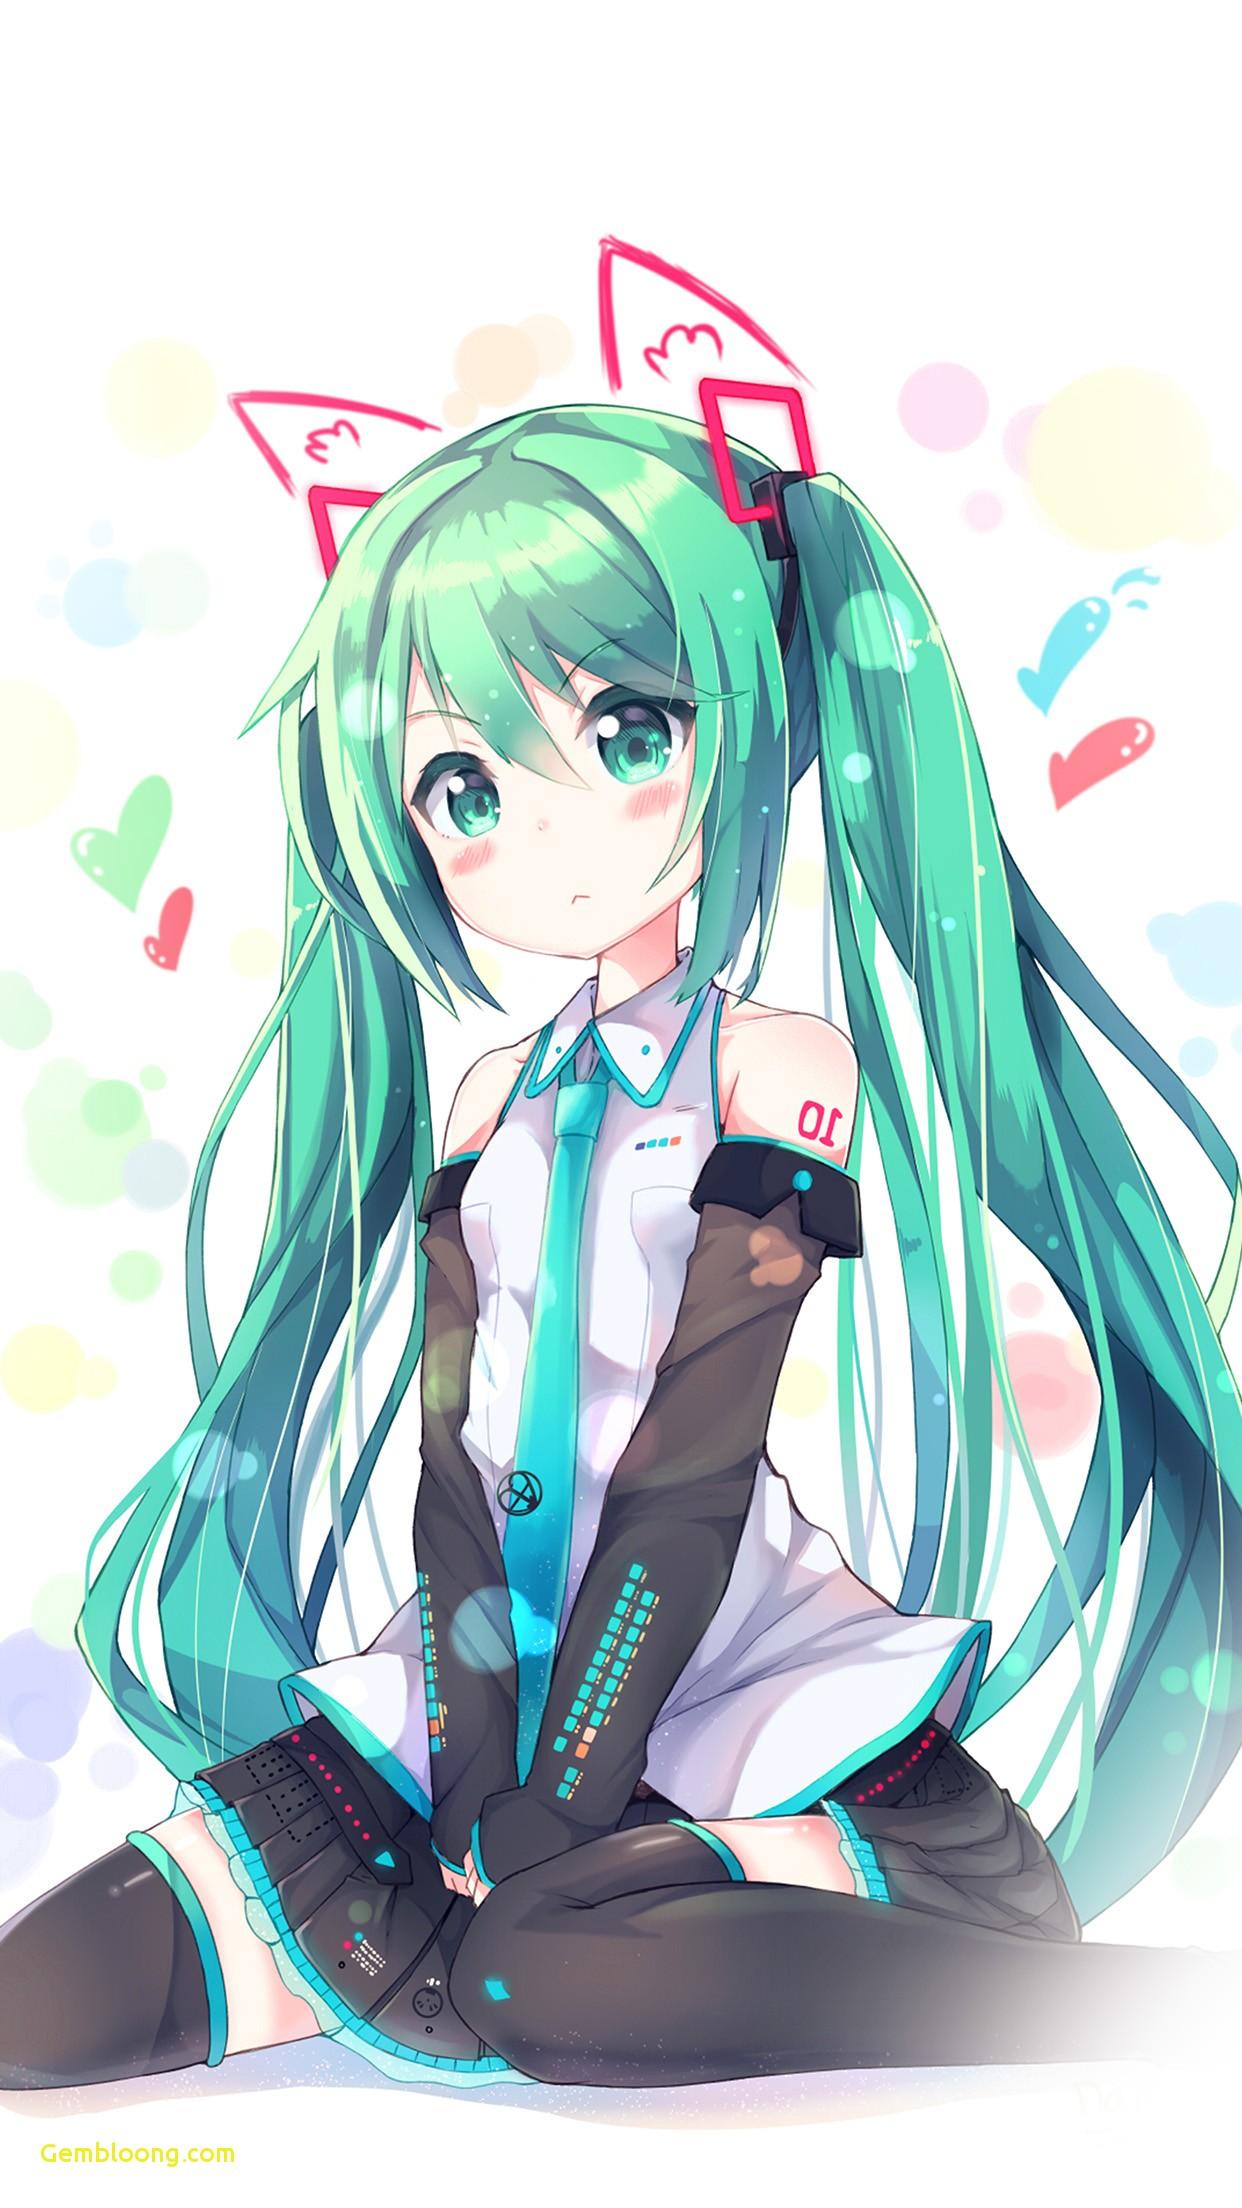 Anime Wallpaper Hd Anime Girl Wallpaper Cute